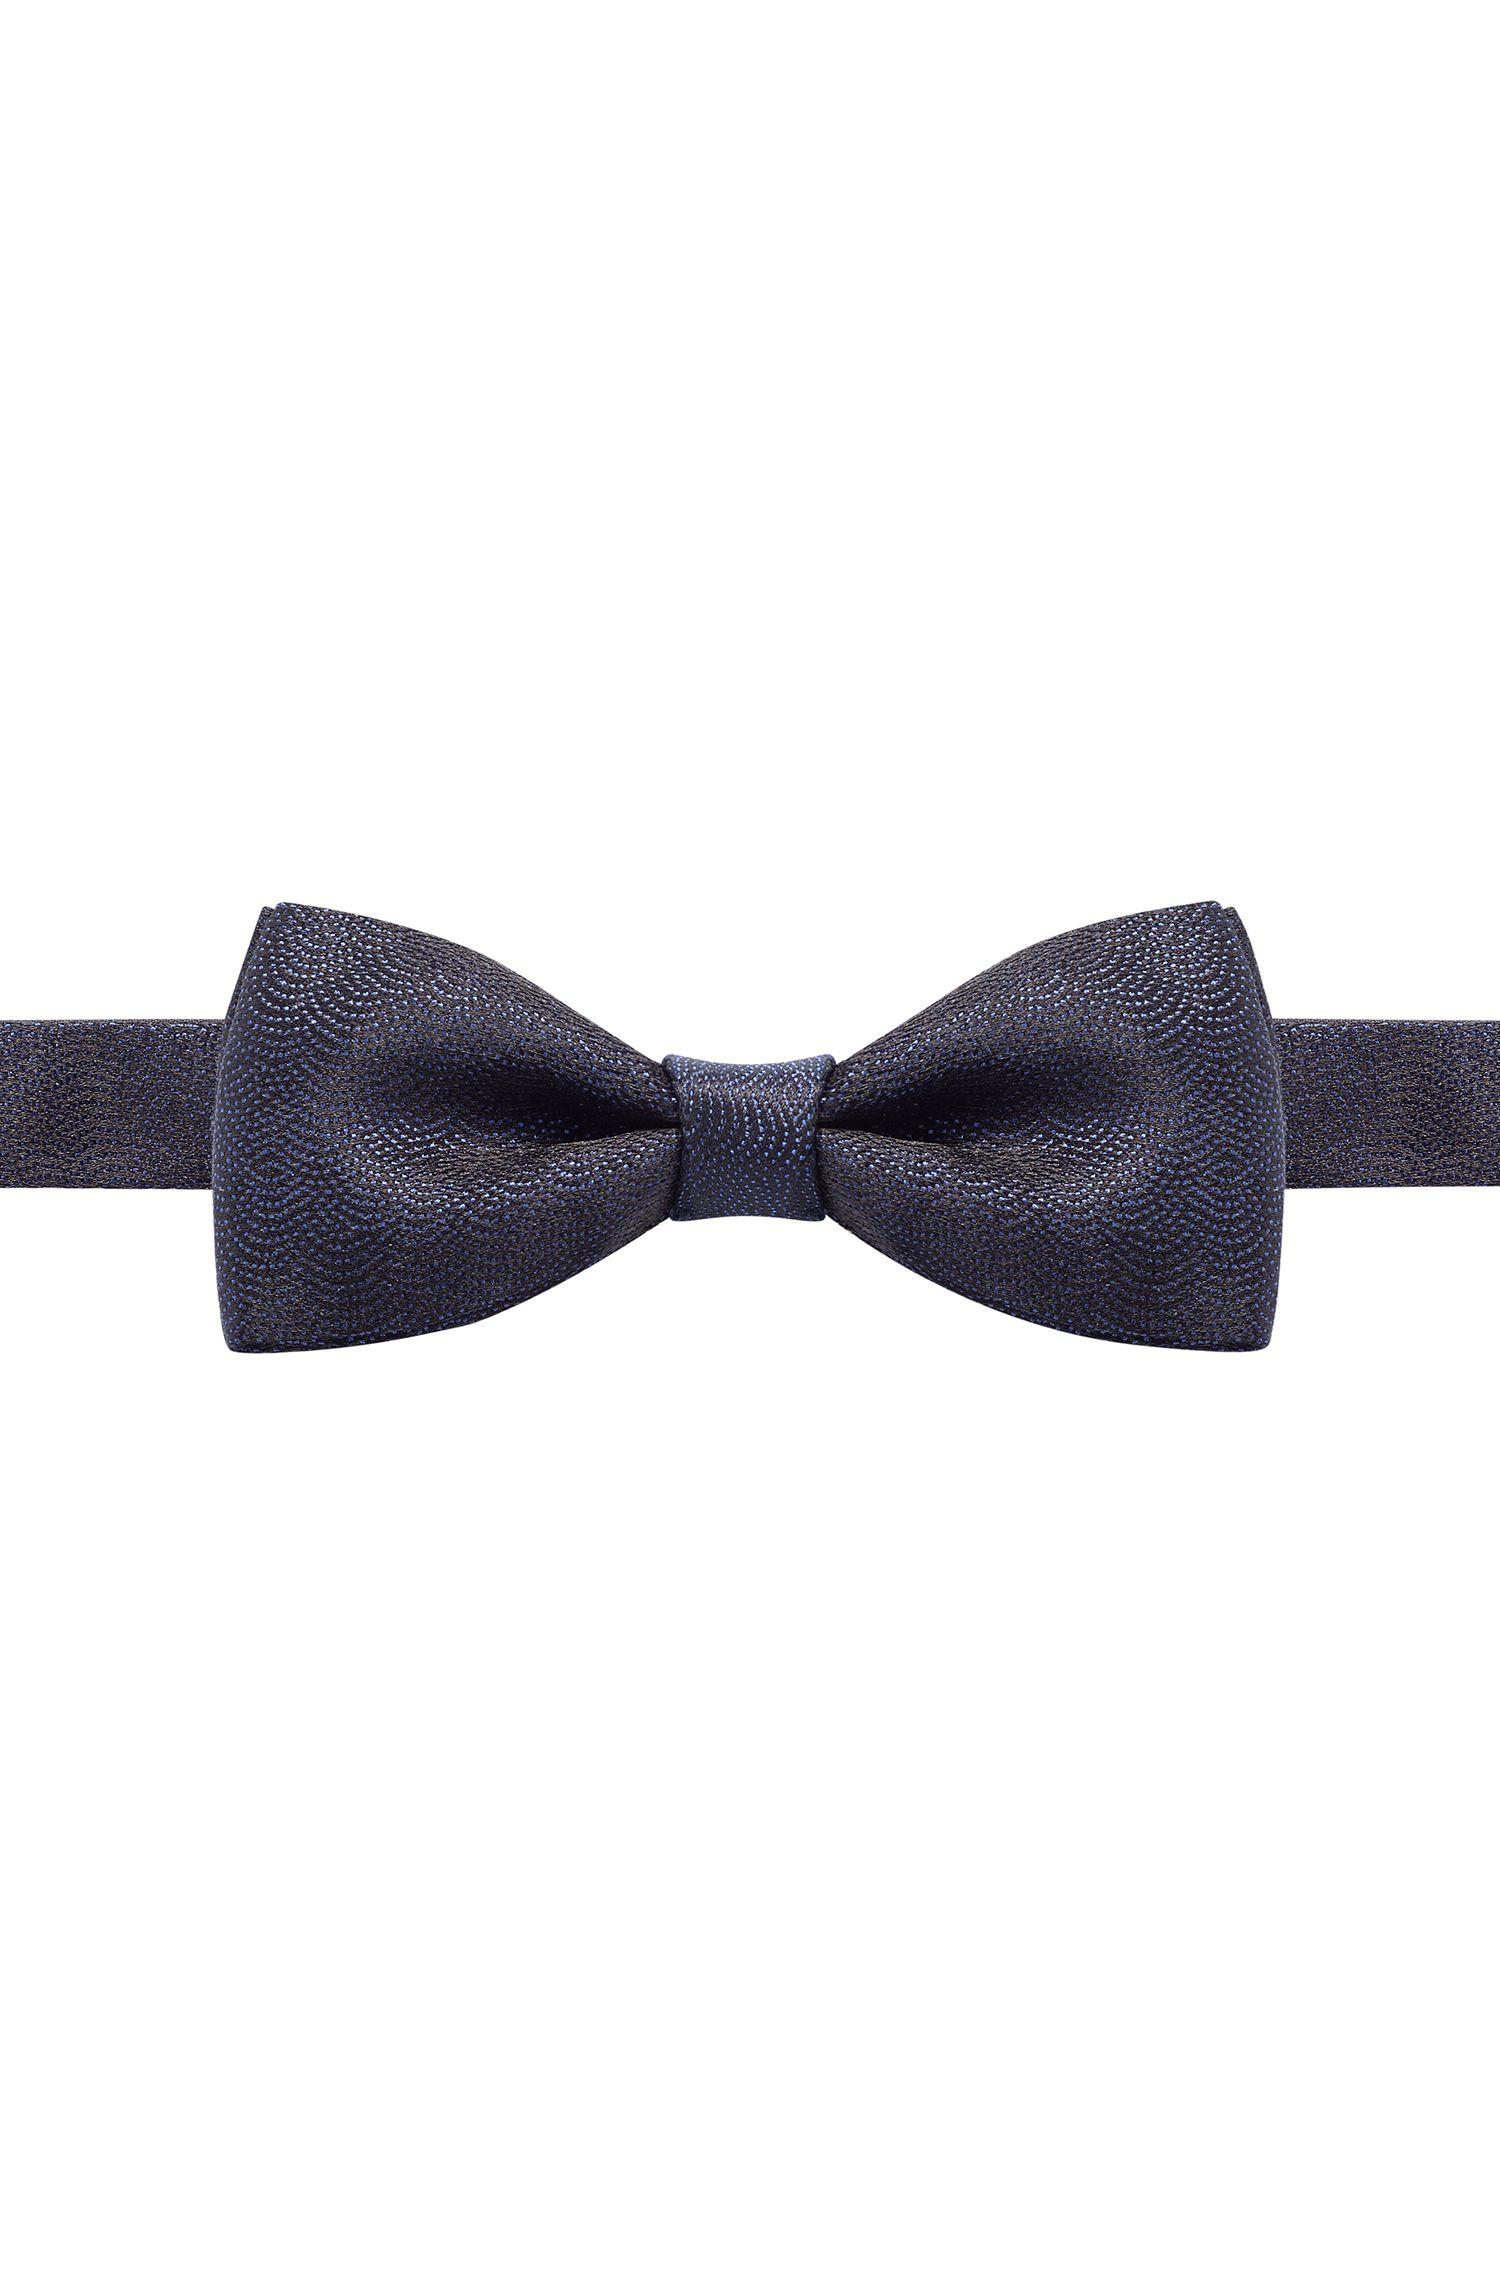 Scallop-Print Italian Silk Bow Tie